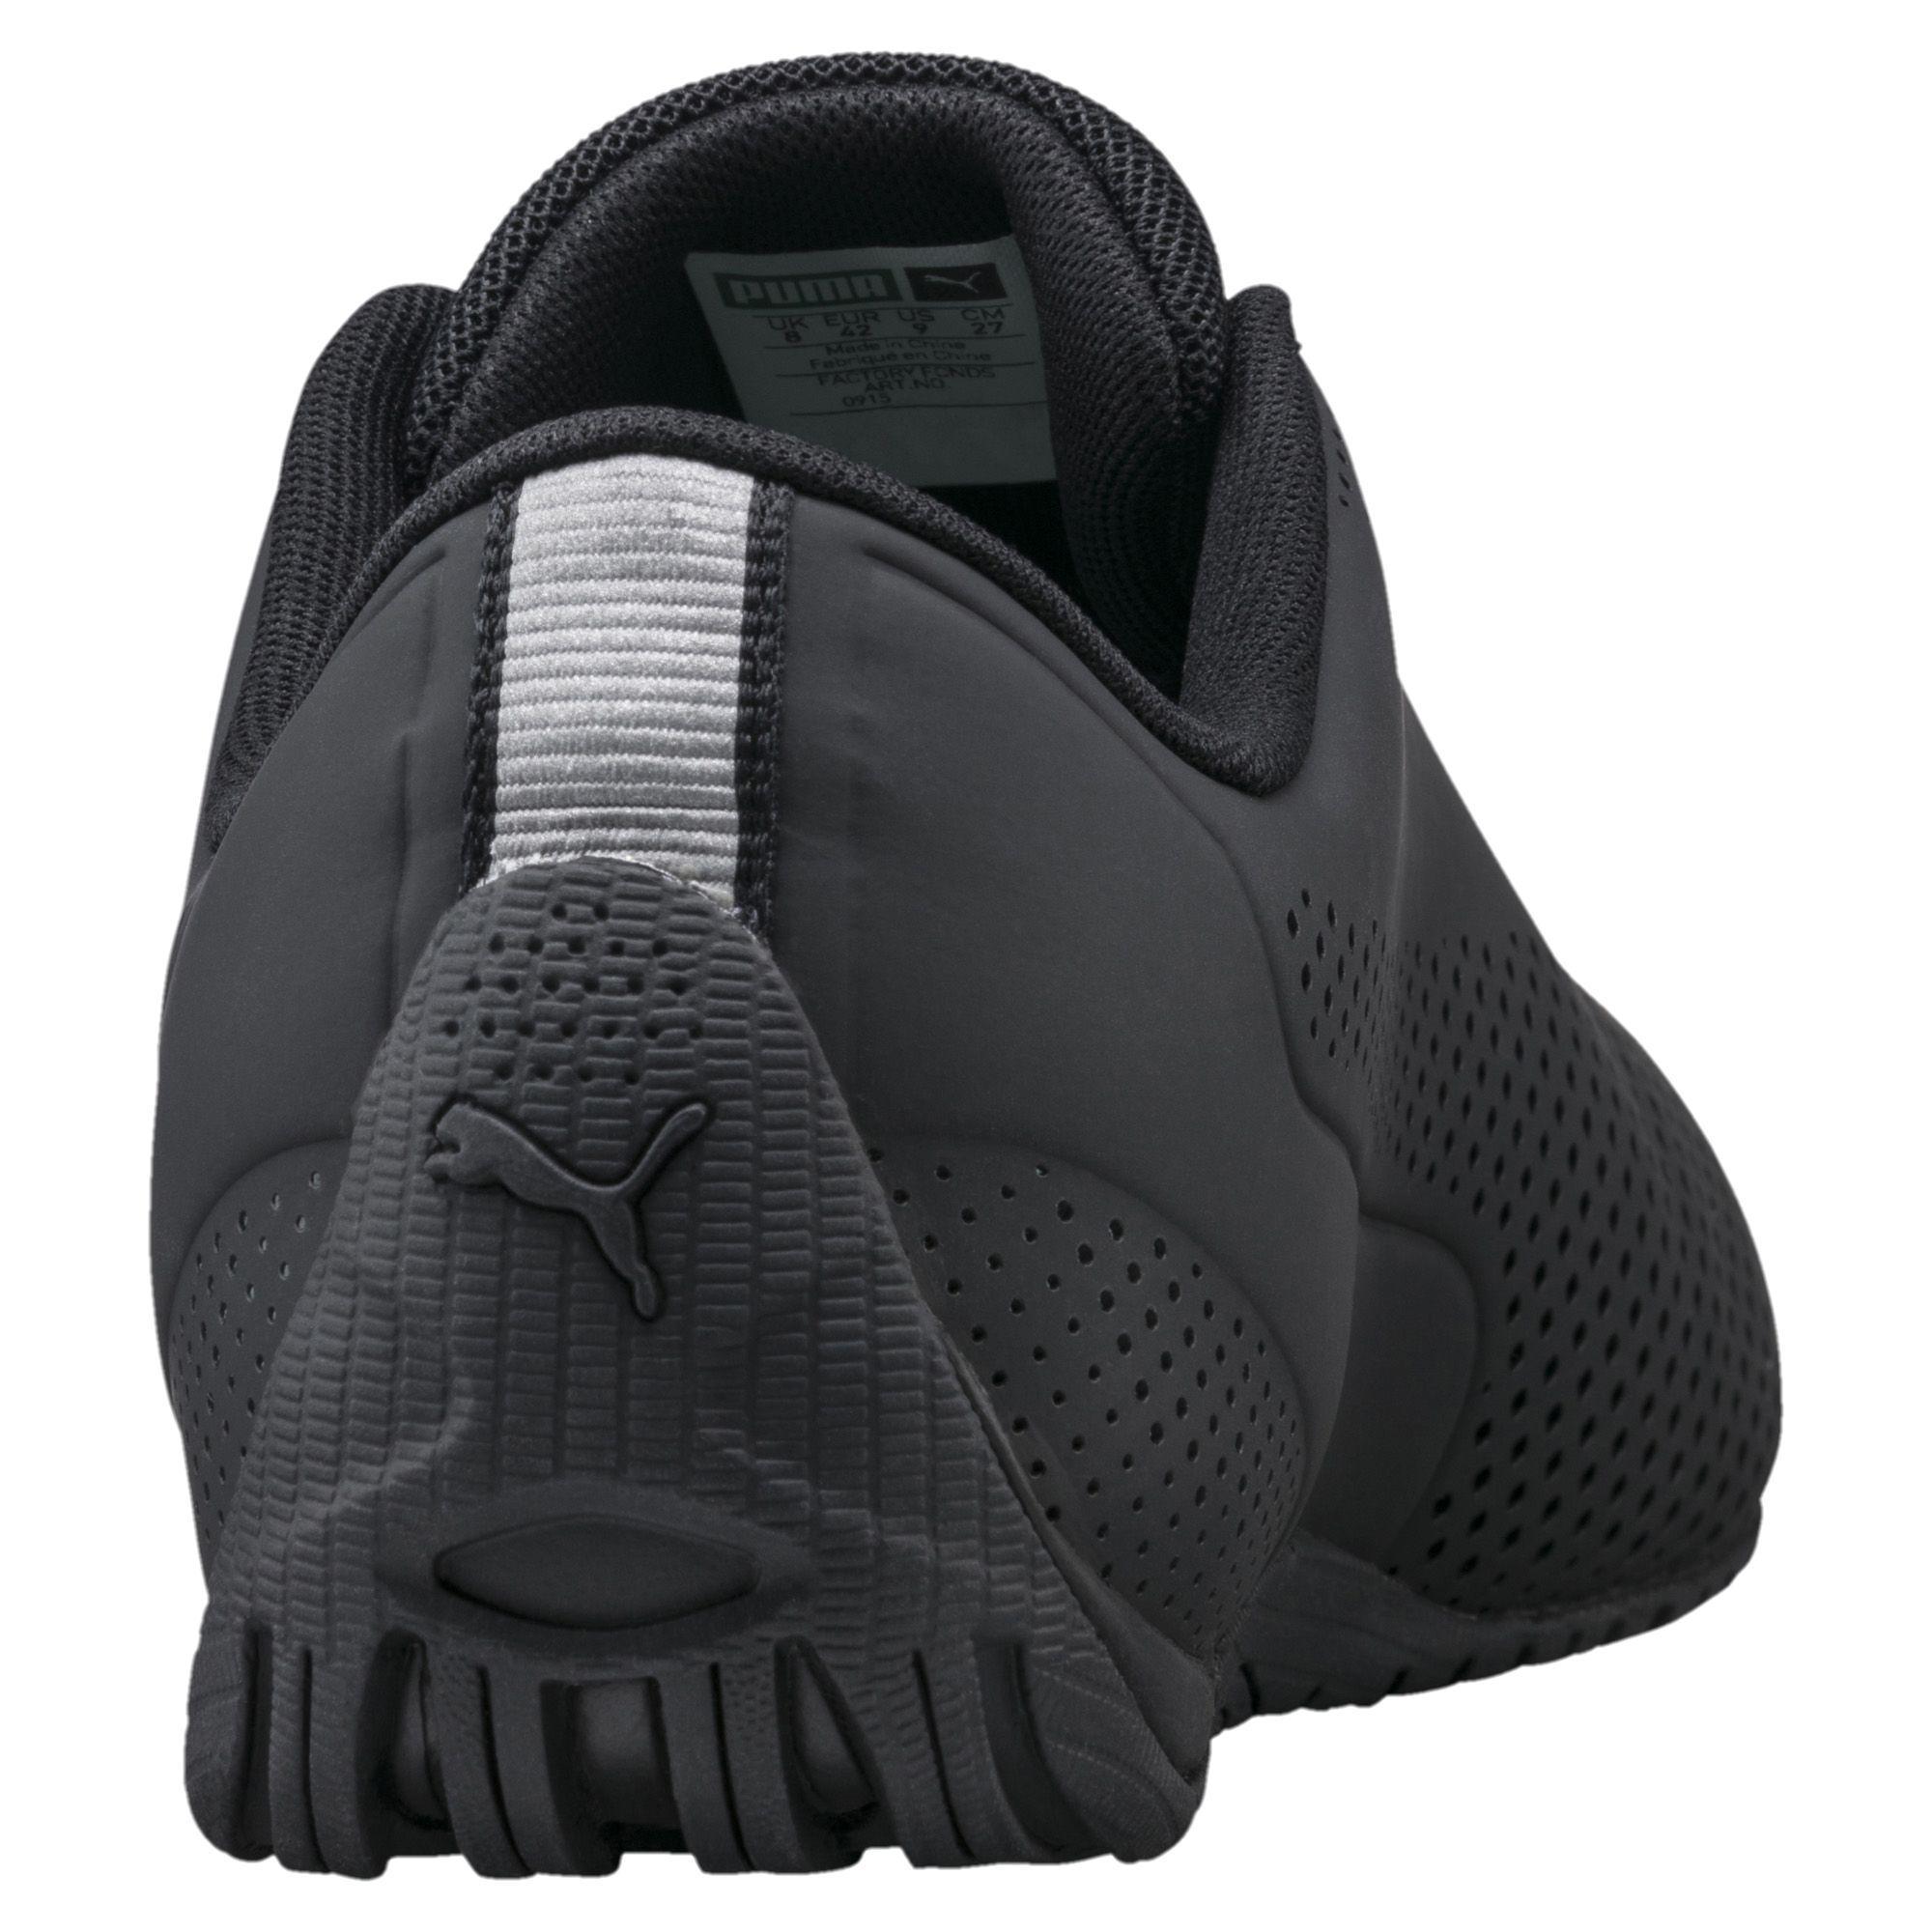 PUMA - Black Drift Cat Ultra Reflective Men s Shoes for Men - Lyst. View  fullscreen 838d695af